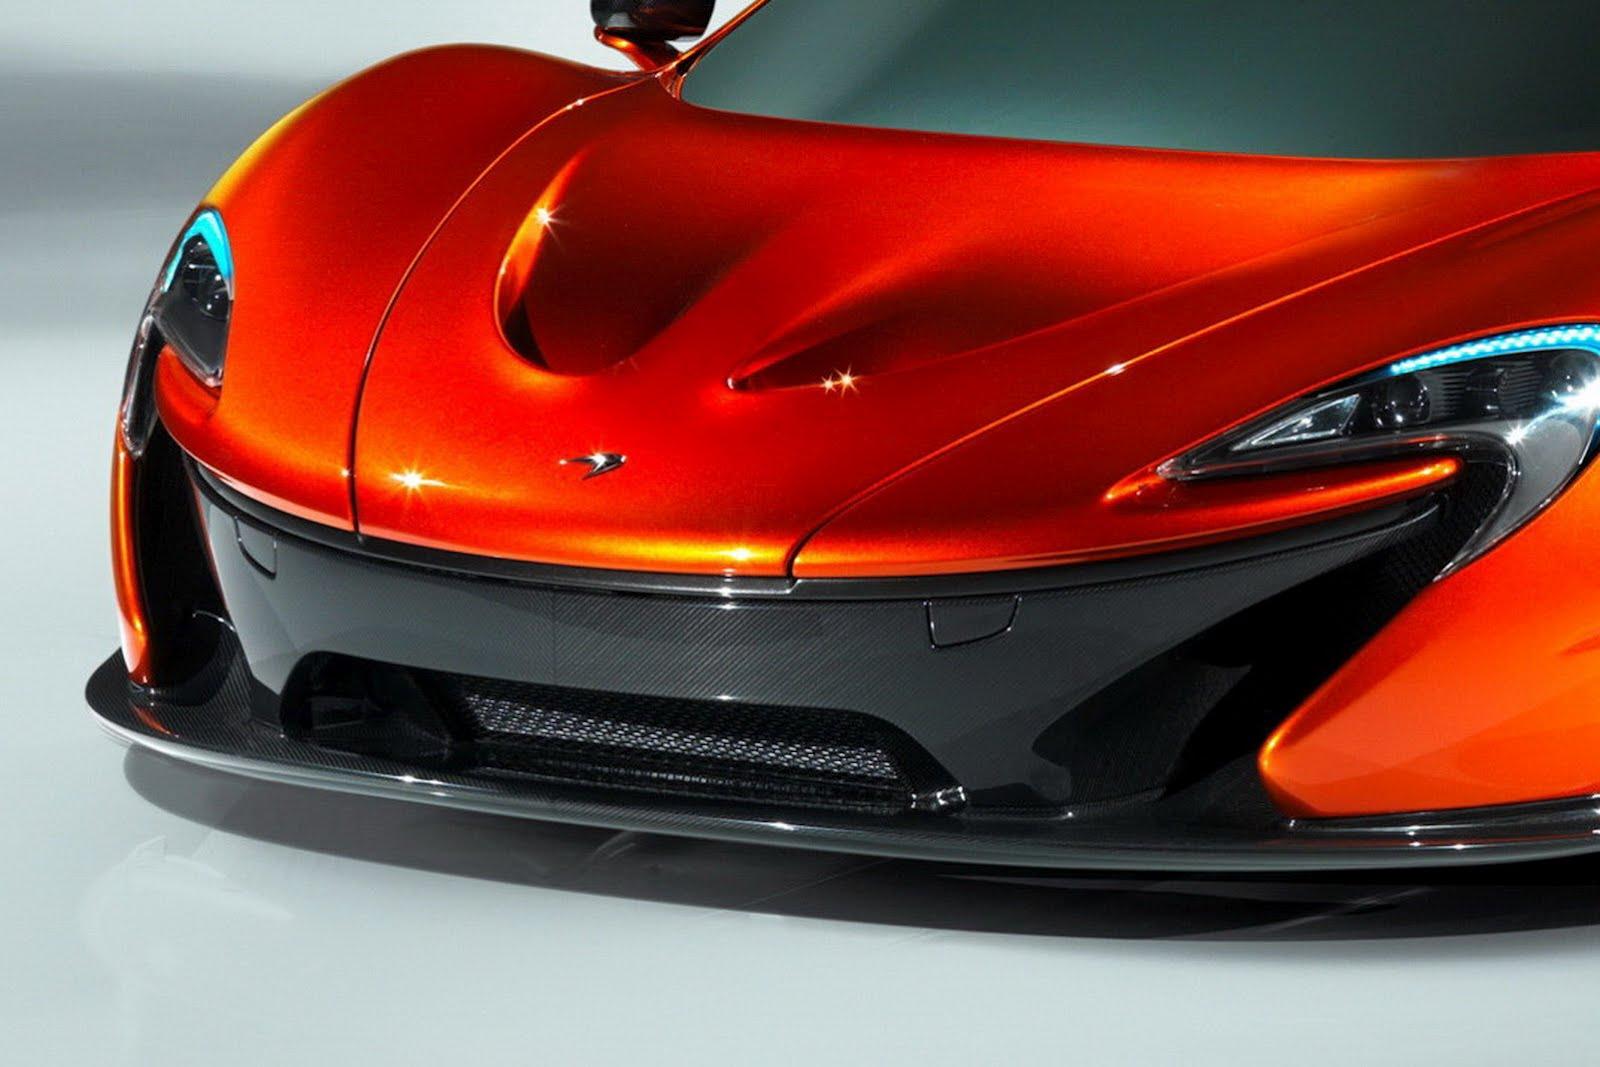 http://1.bp.blogspot.com/-MvBo_CNMXXg/UFkKYqGZy6I/AAAAAAAAQlA/fG6Mkb0P47Q/s1600/McLaren+P1+Concept+%282012%293.jpg